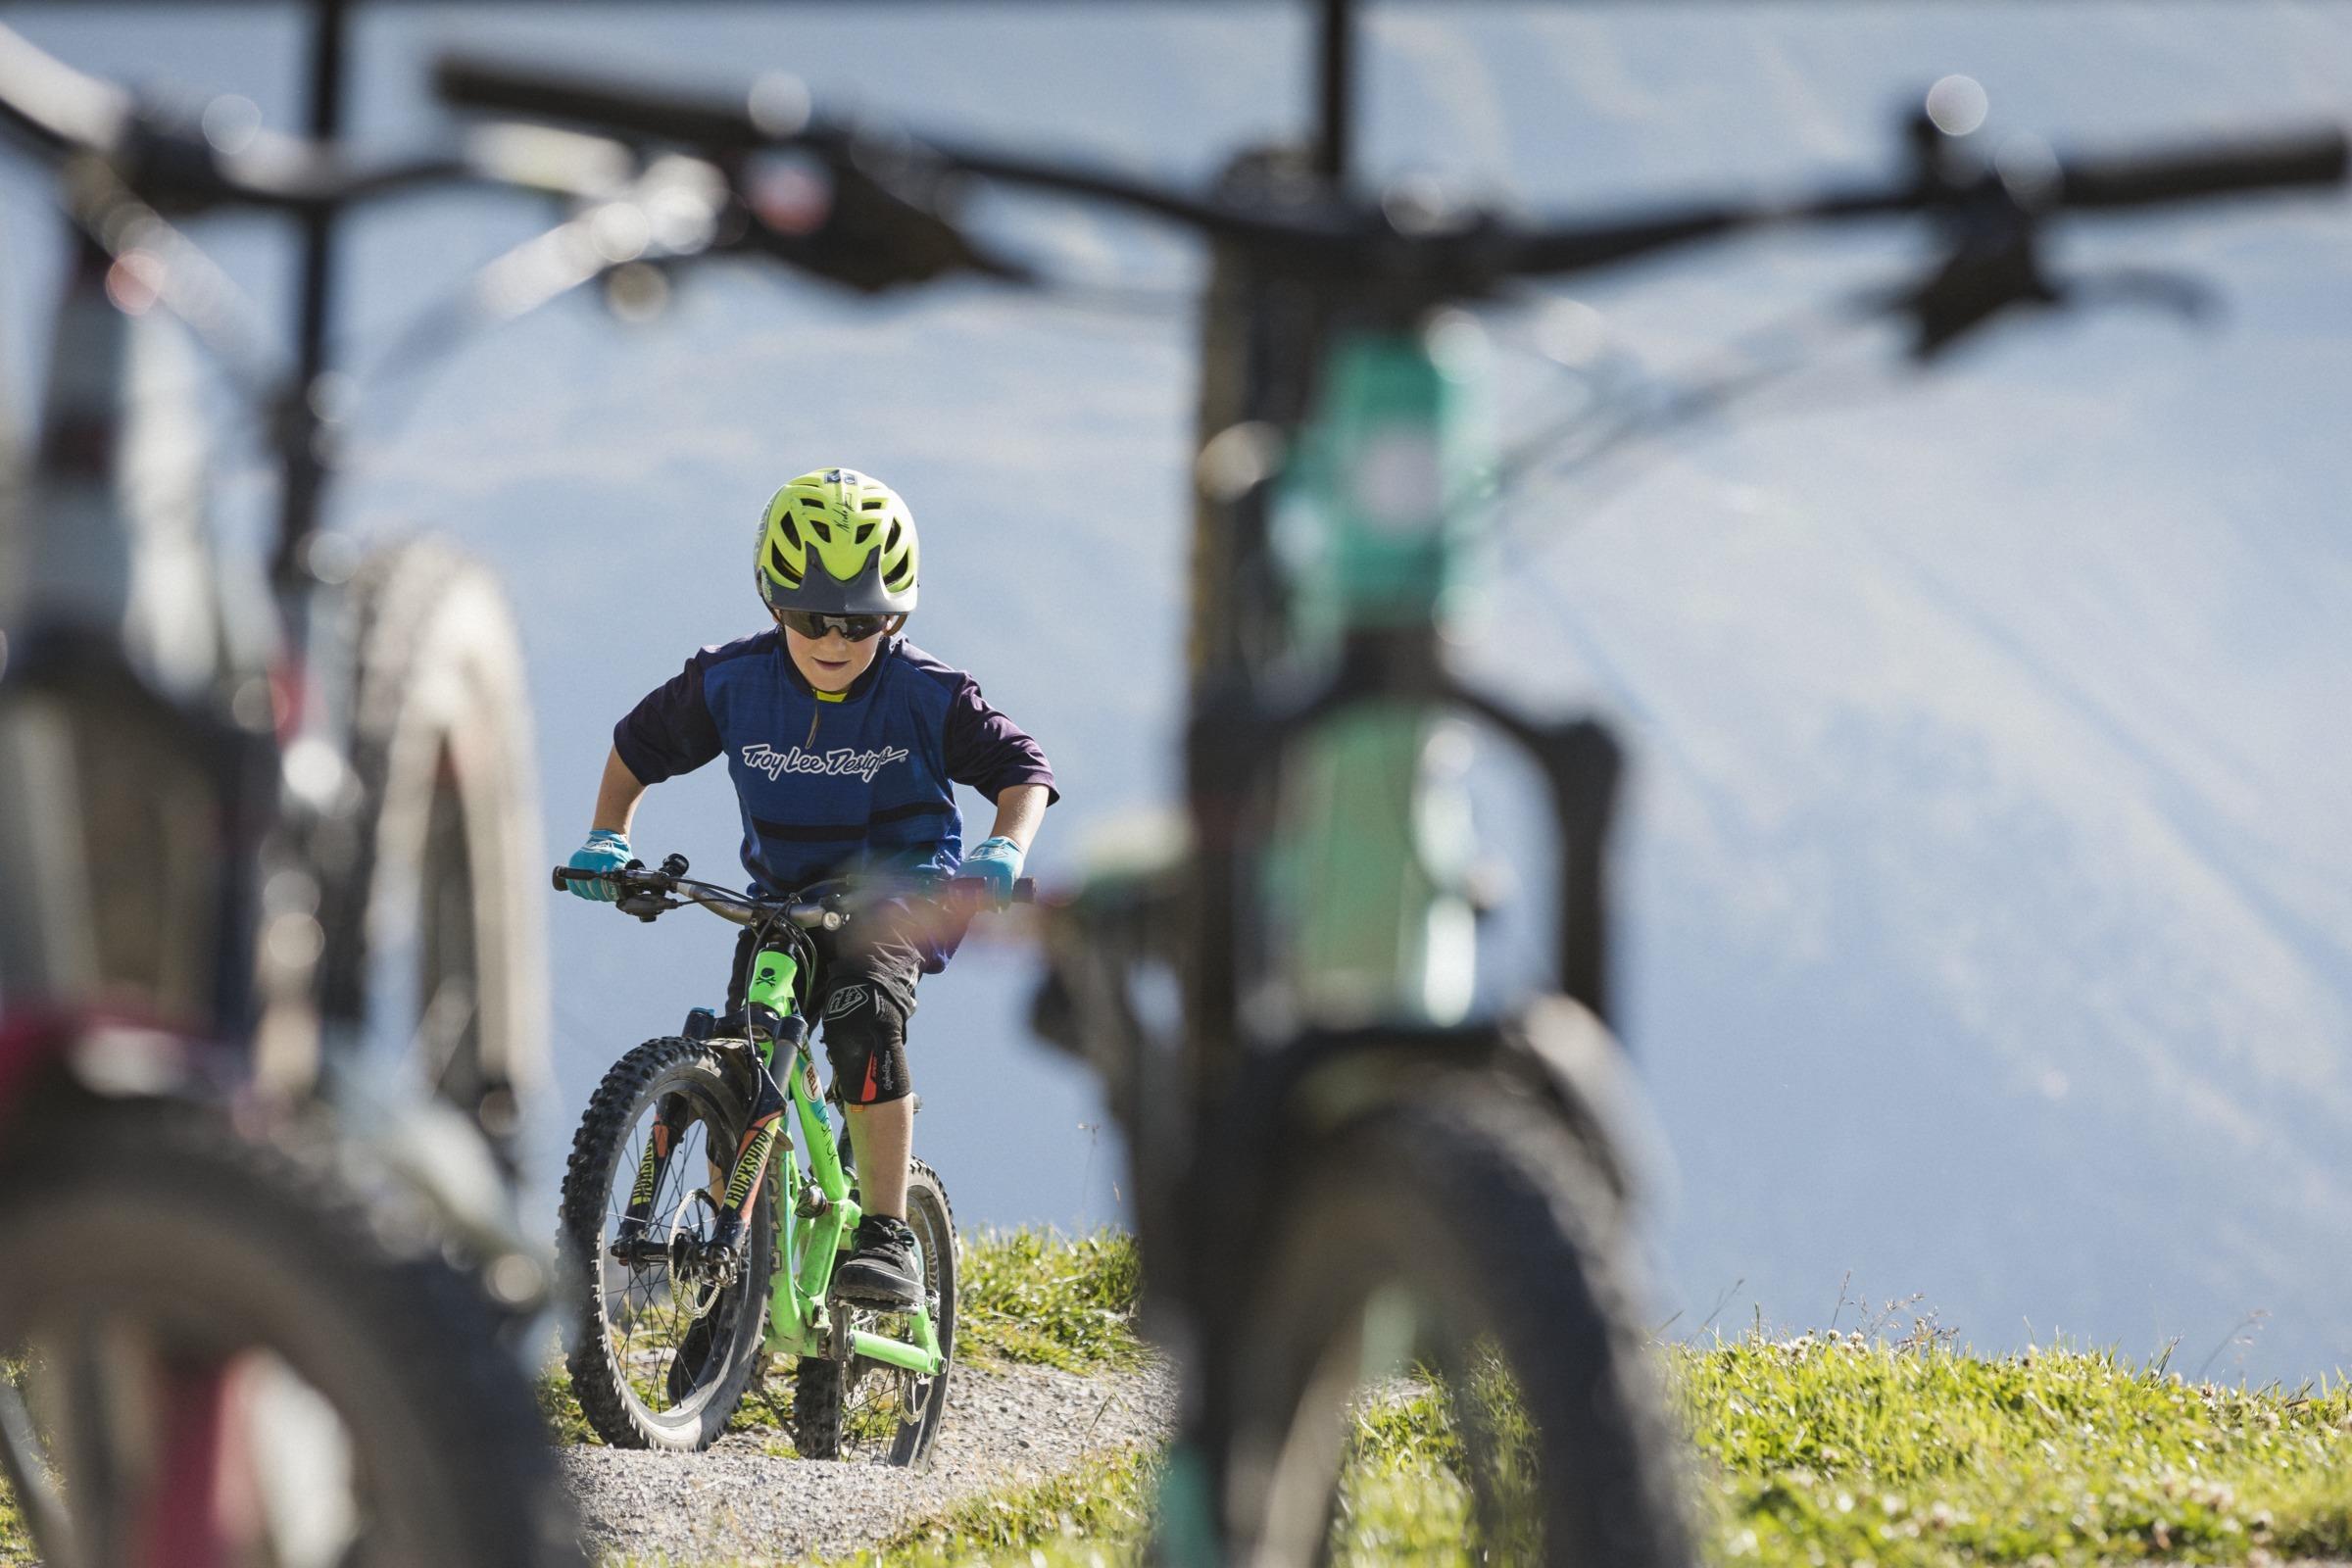 Mountainbike-Transport: Postauto Graubünden